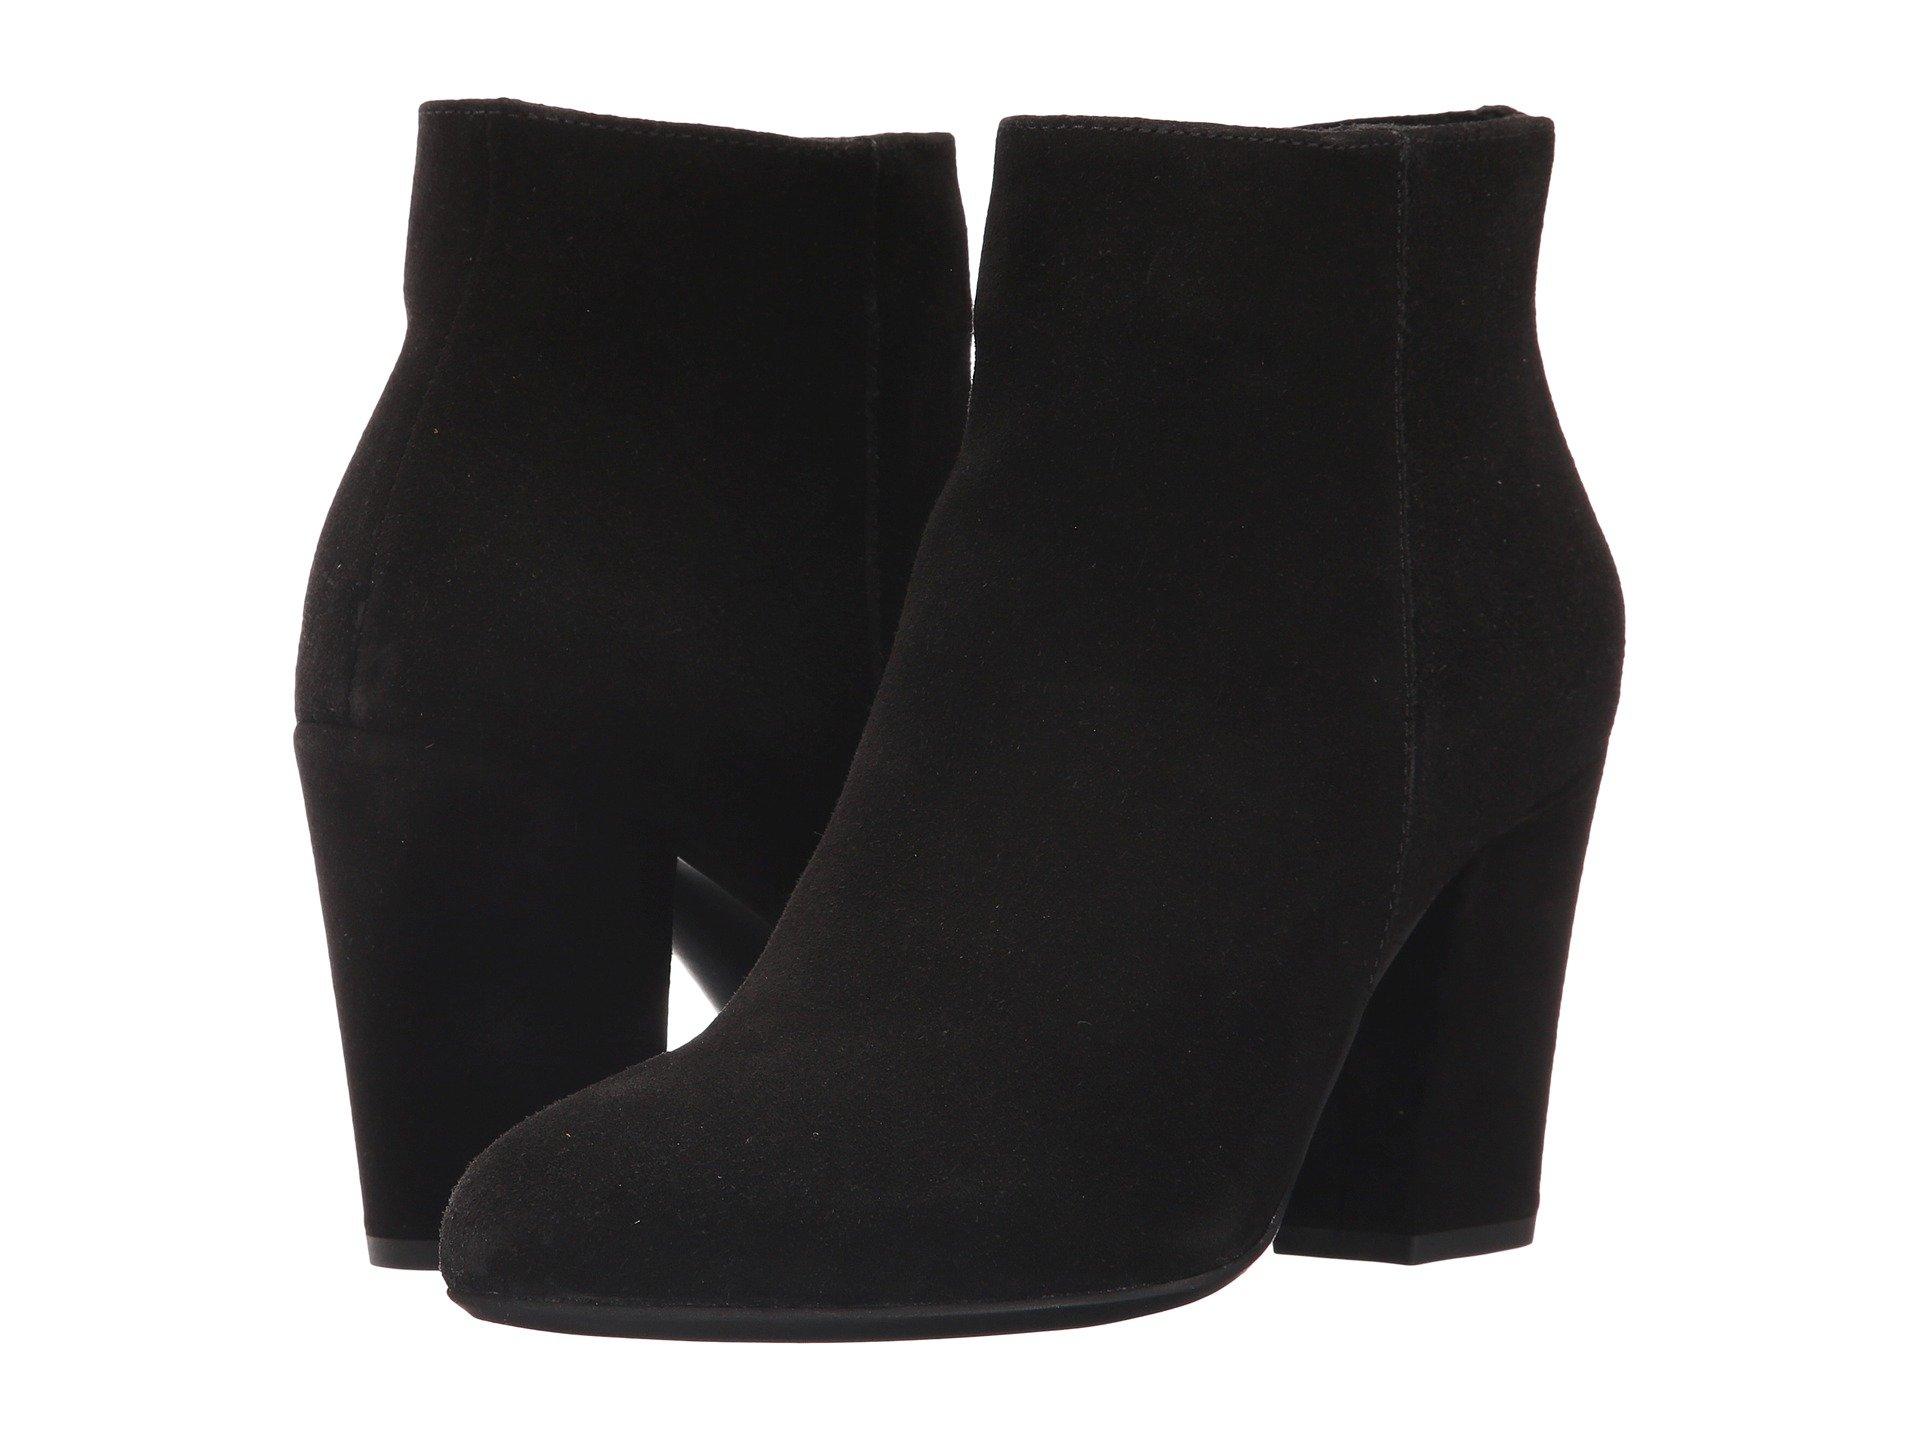 2416c960c568 Women s La Canadienne Shoes + FREE SHIPPING